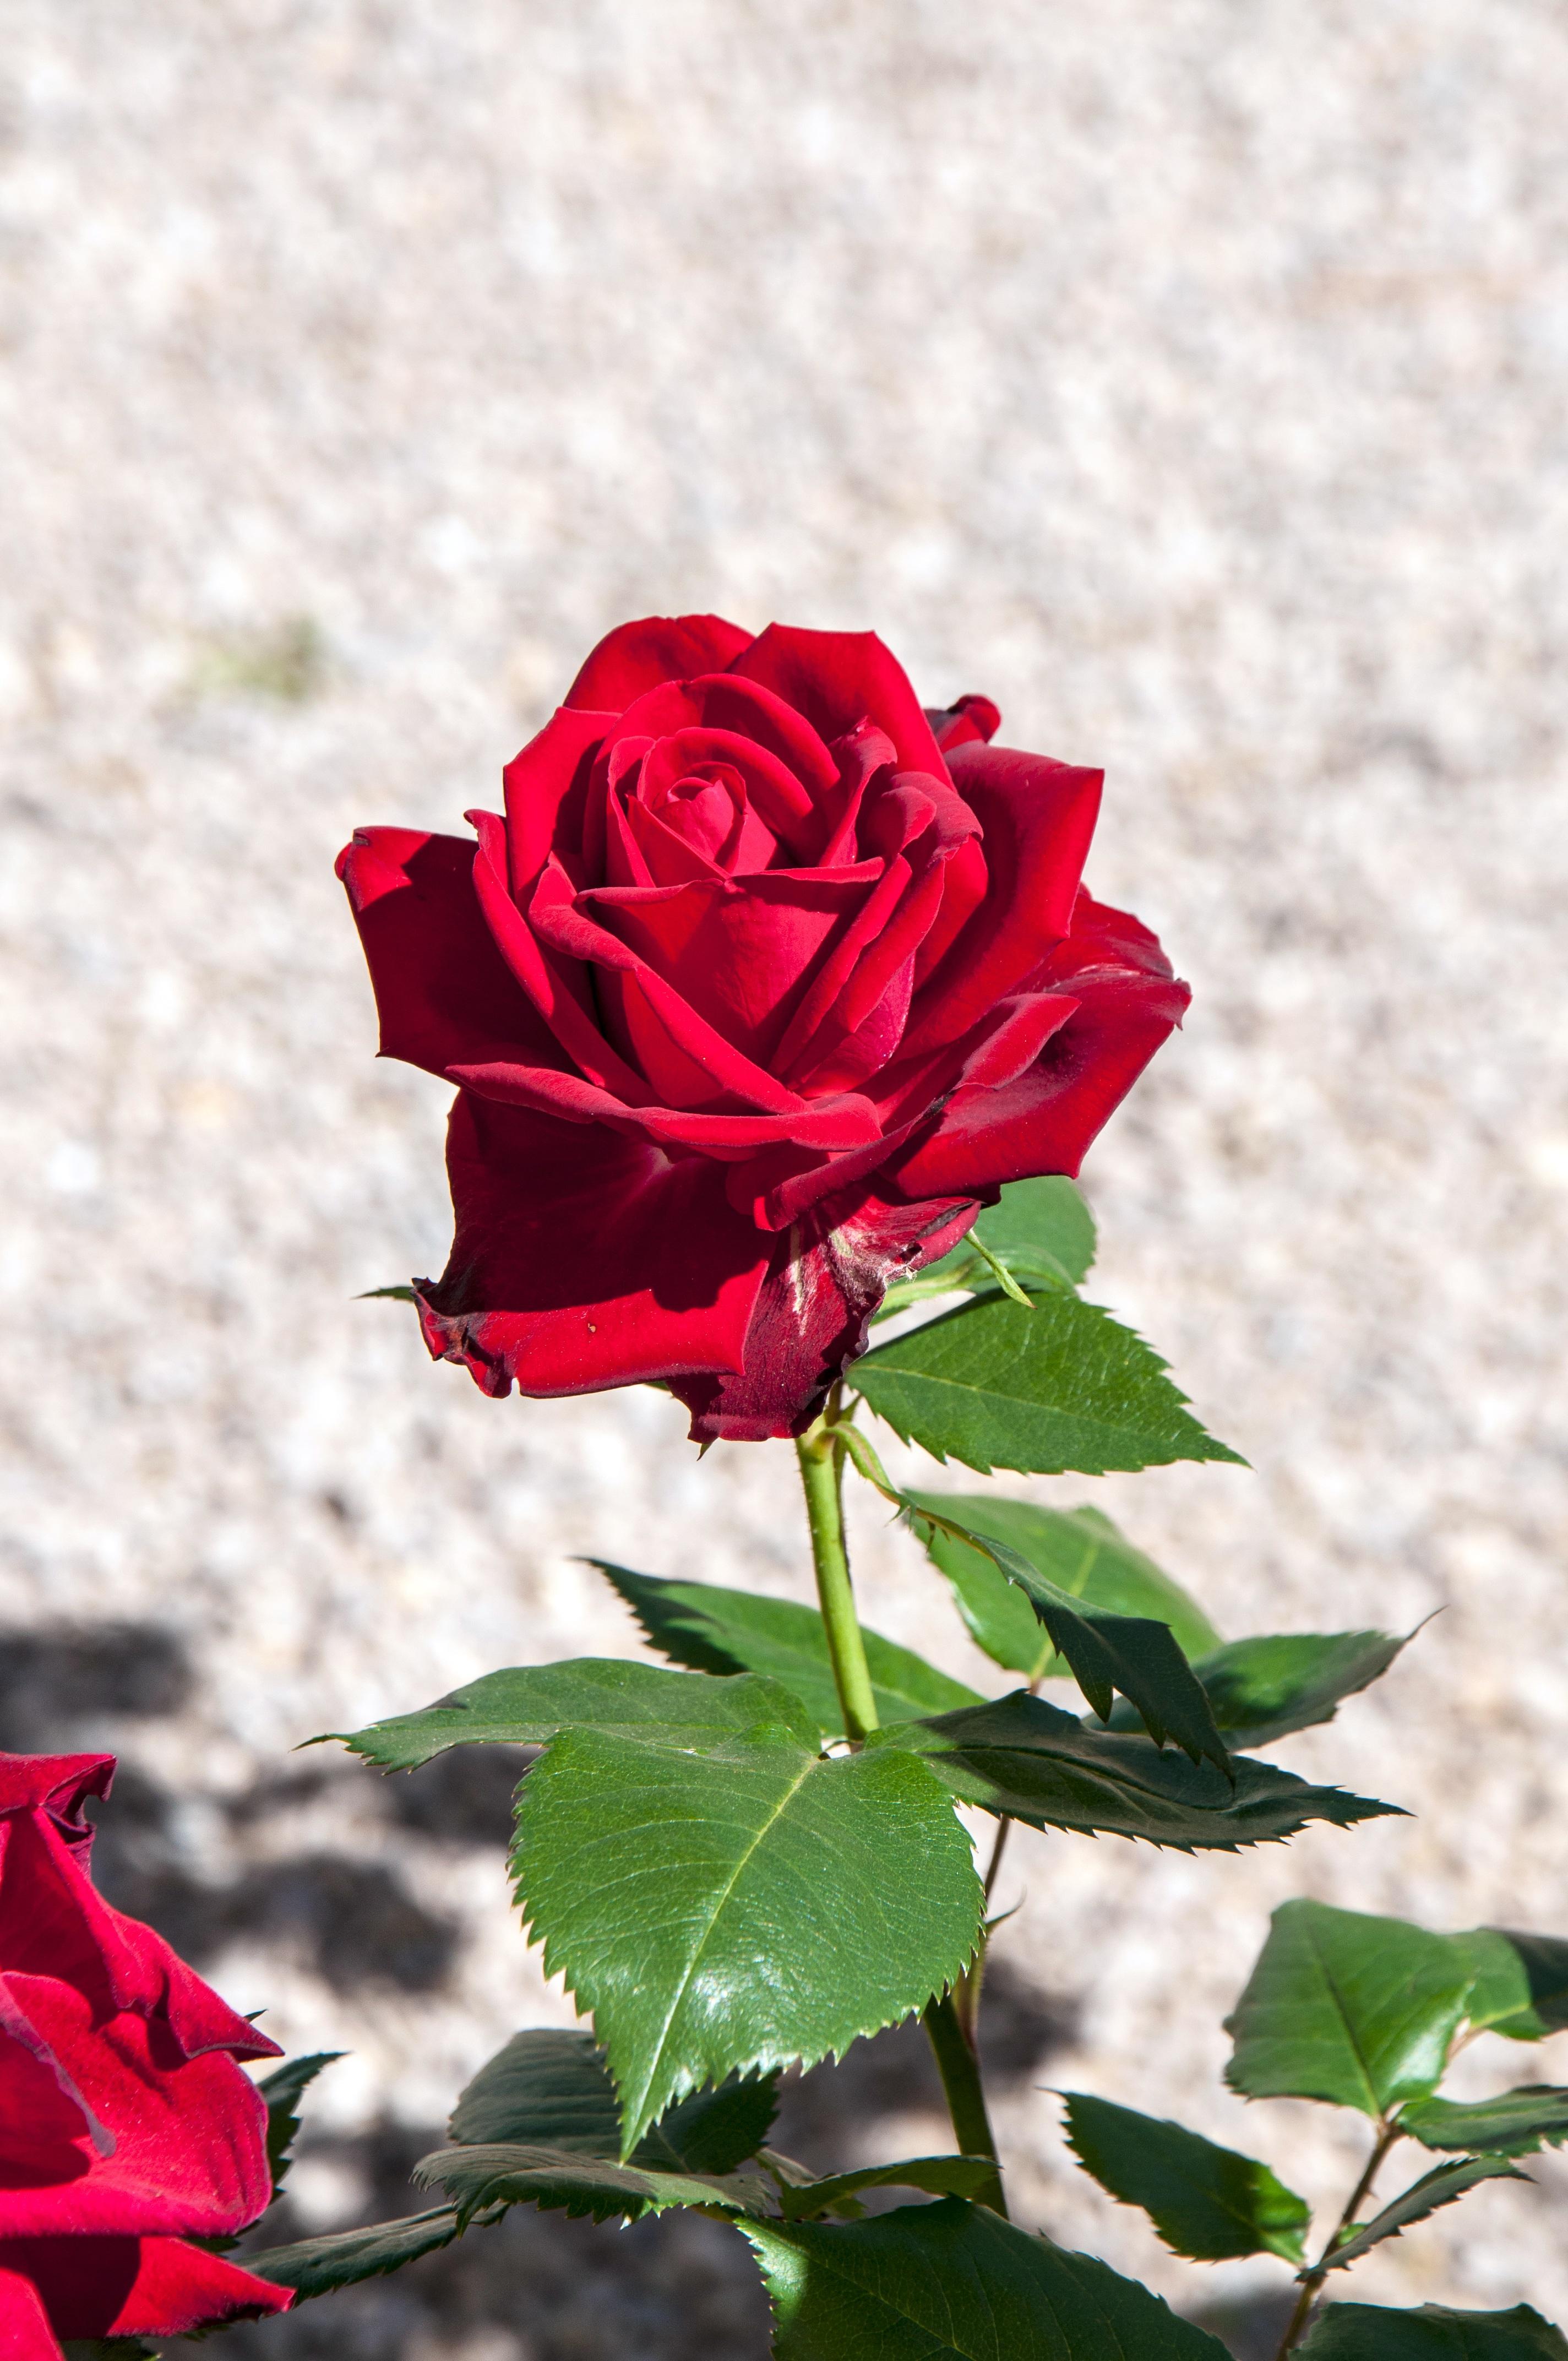 Free Images : texture, leaf, flower, petal, botany, pink, flora, red rose, petals, macro ...